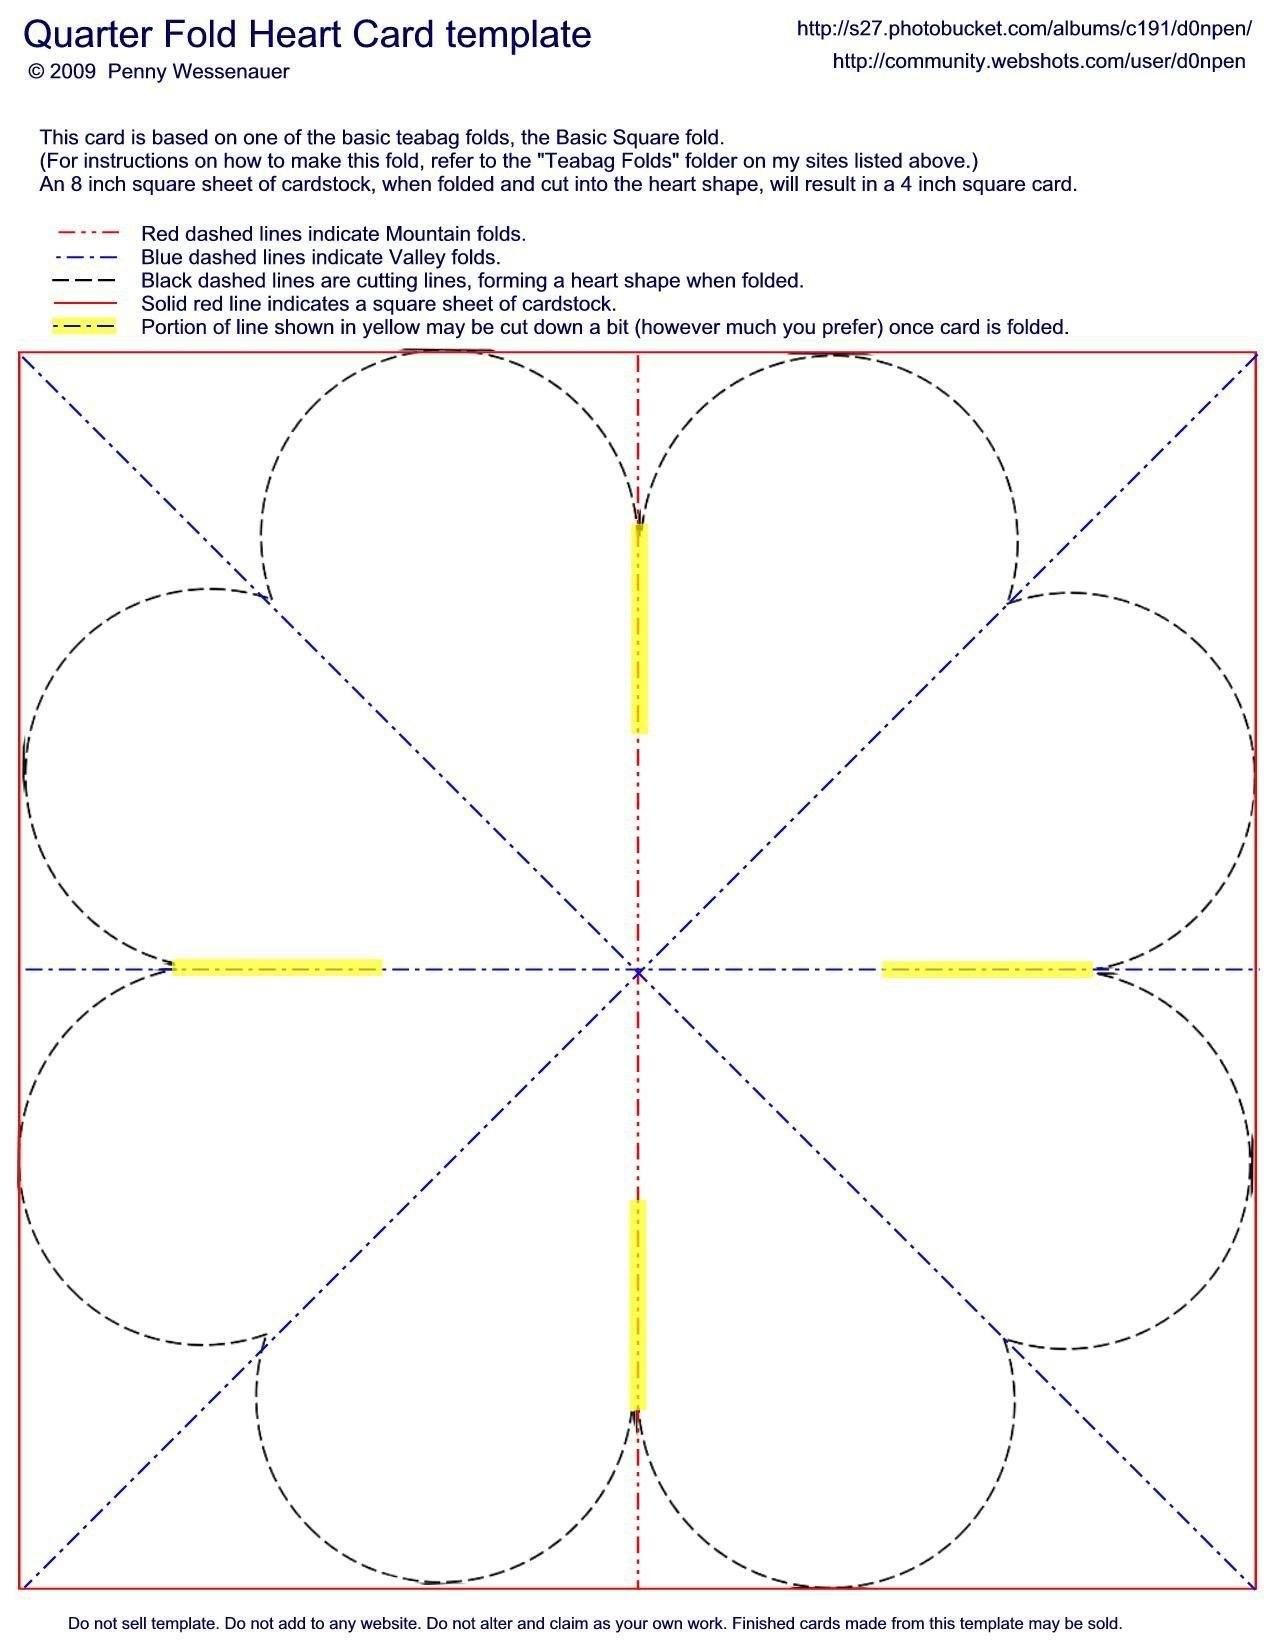 Quarterfold Heart Card Template  Fancy Folds  Card Making For Quarter Fold Card Template